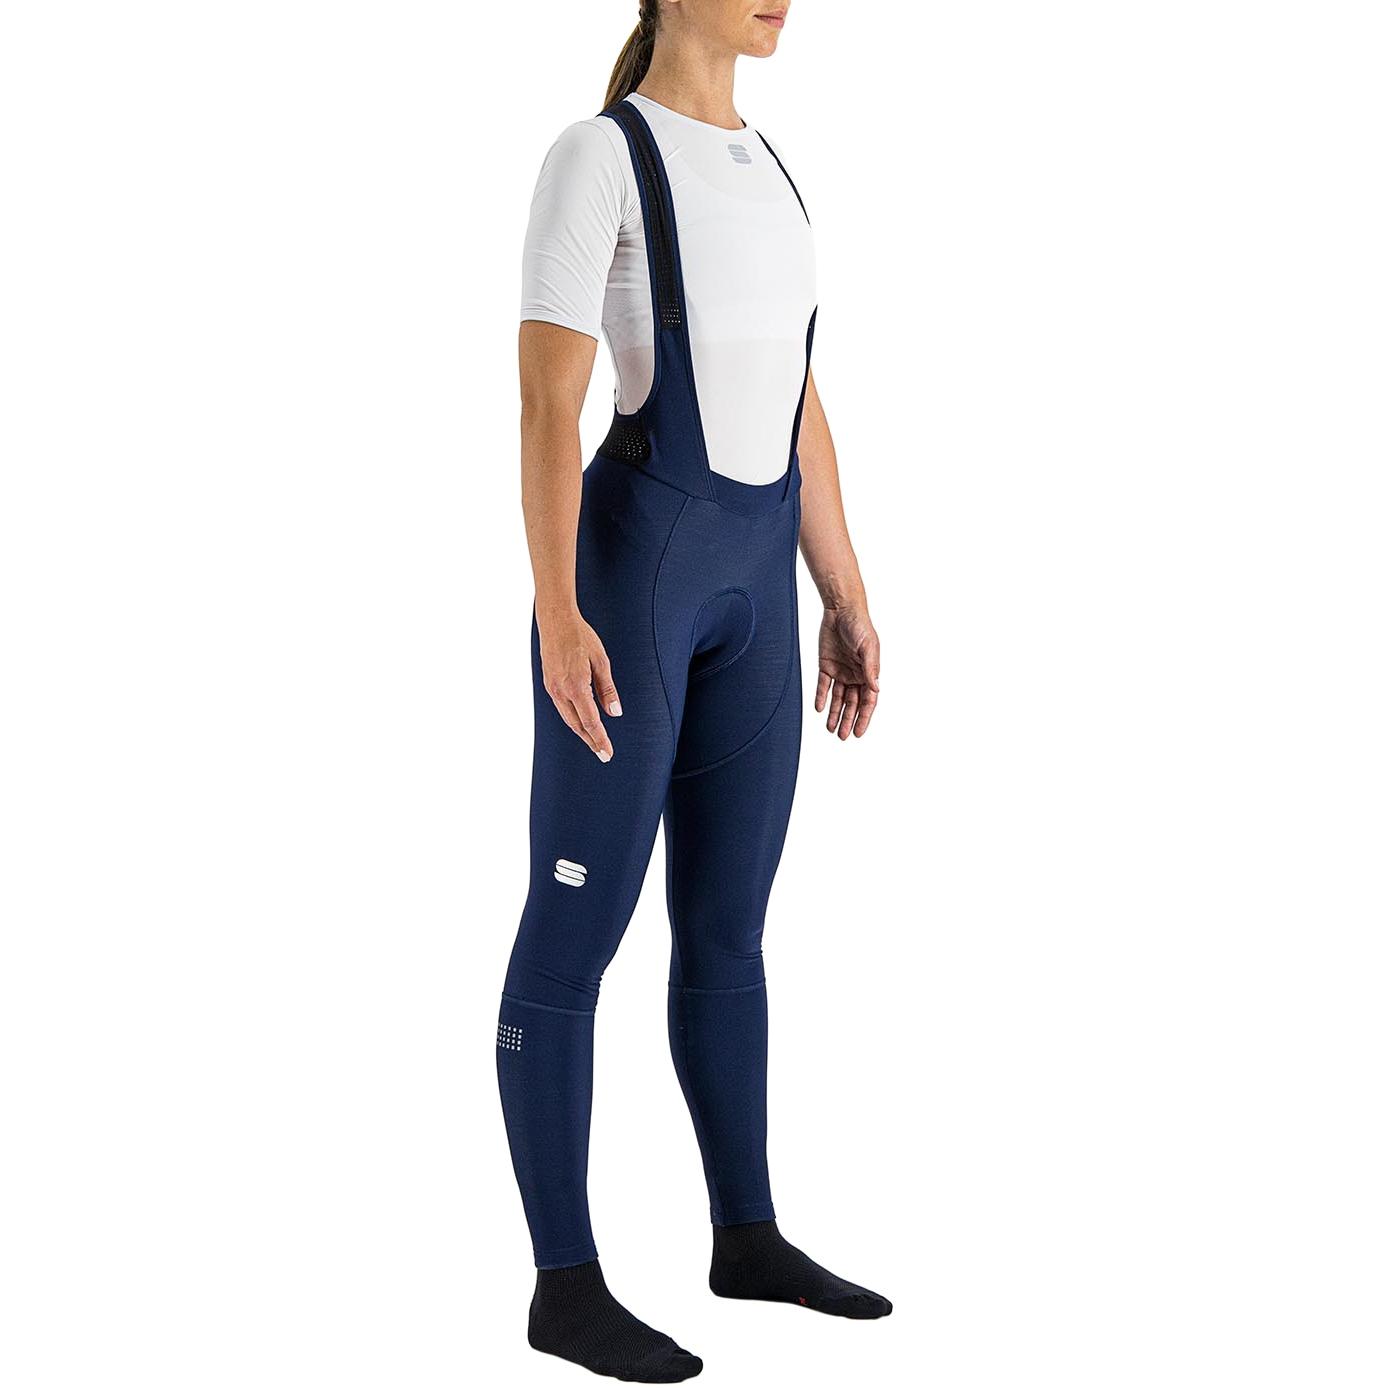 Sportful Neo Women's Bibtight - 013 Blue